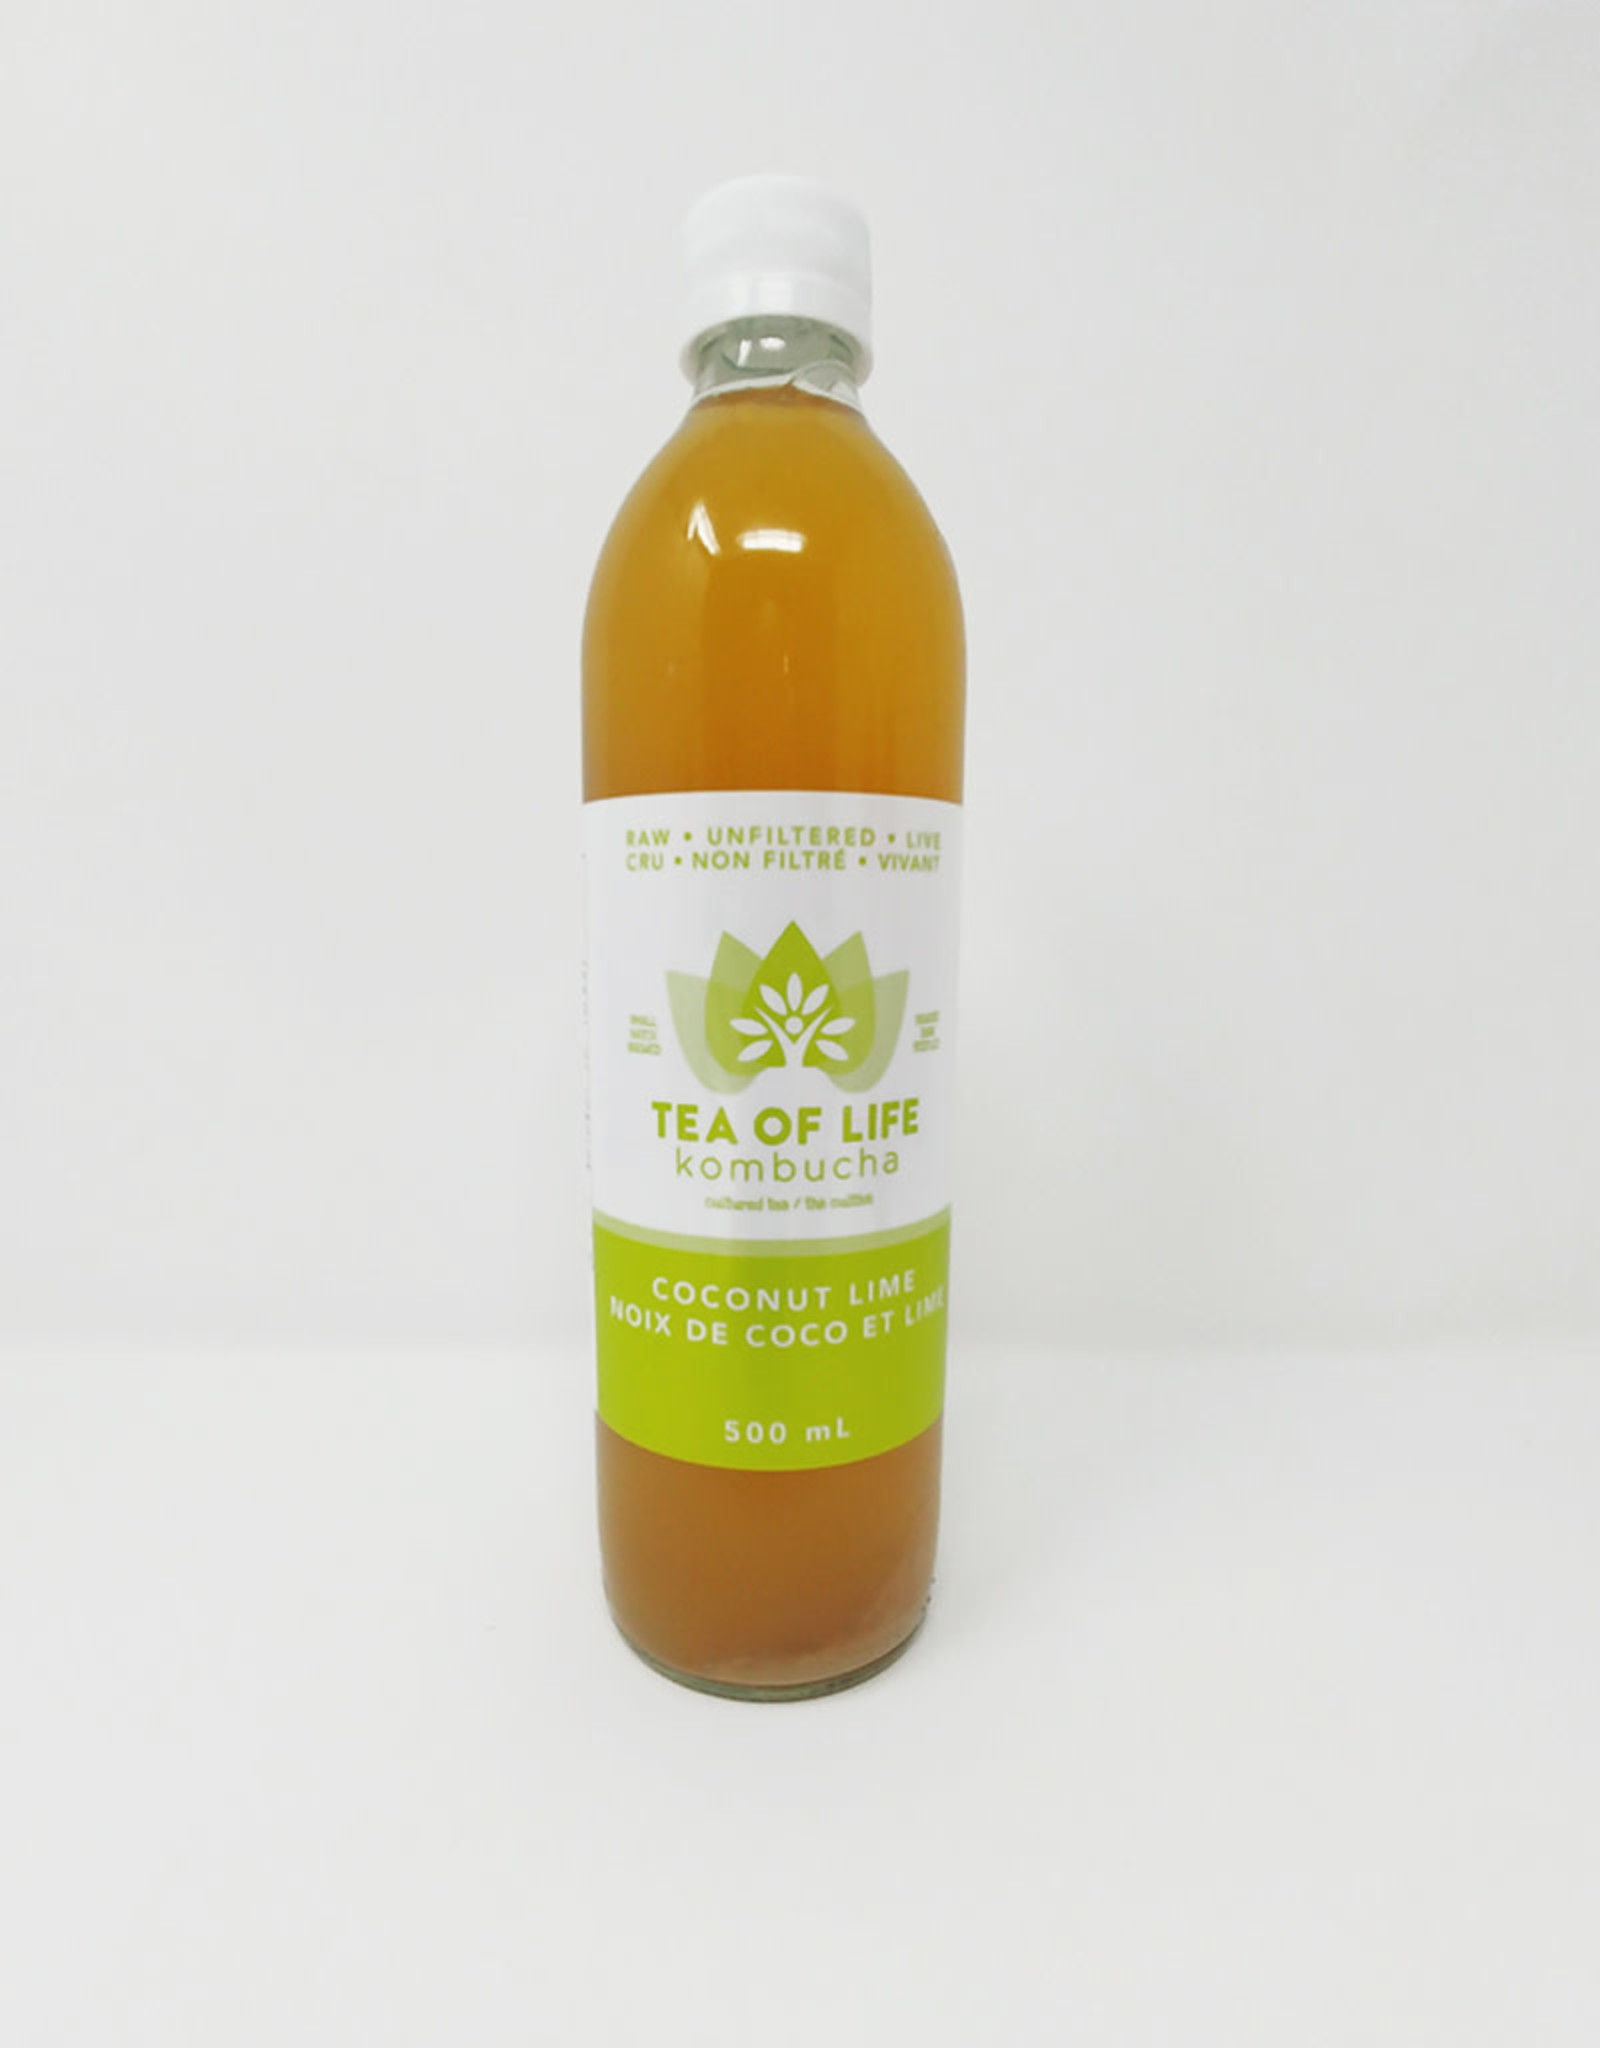 Tea of Life Tea of Life - Kombucha, Coconut Lime